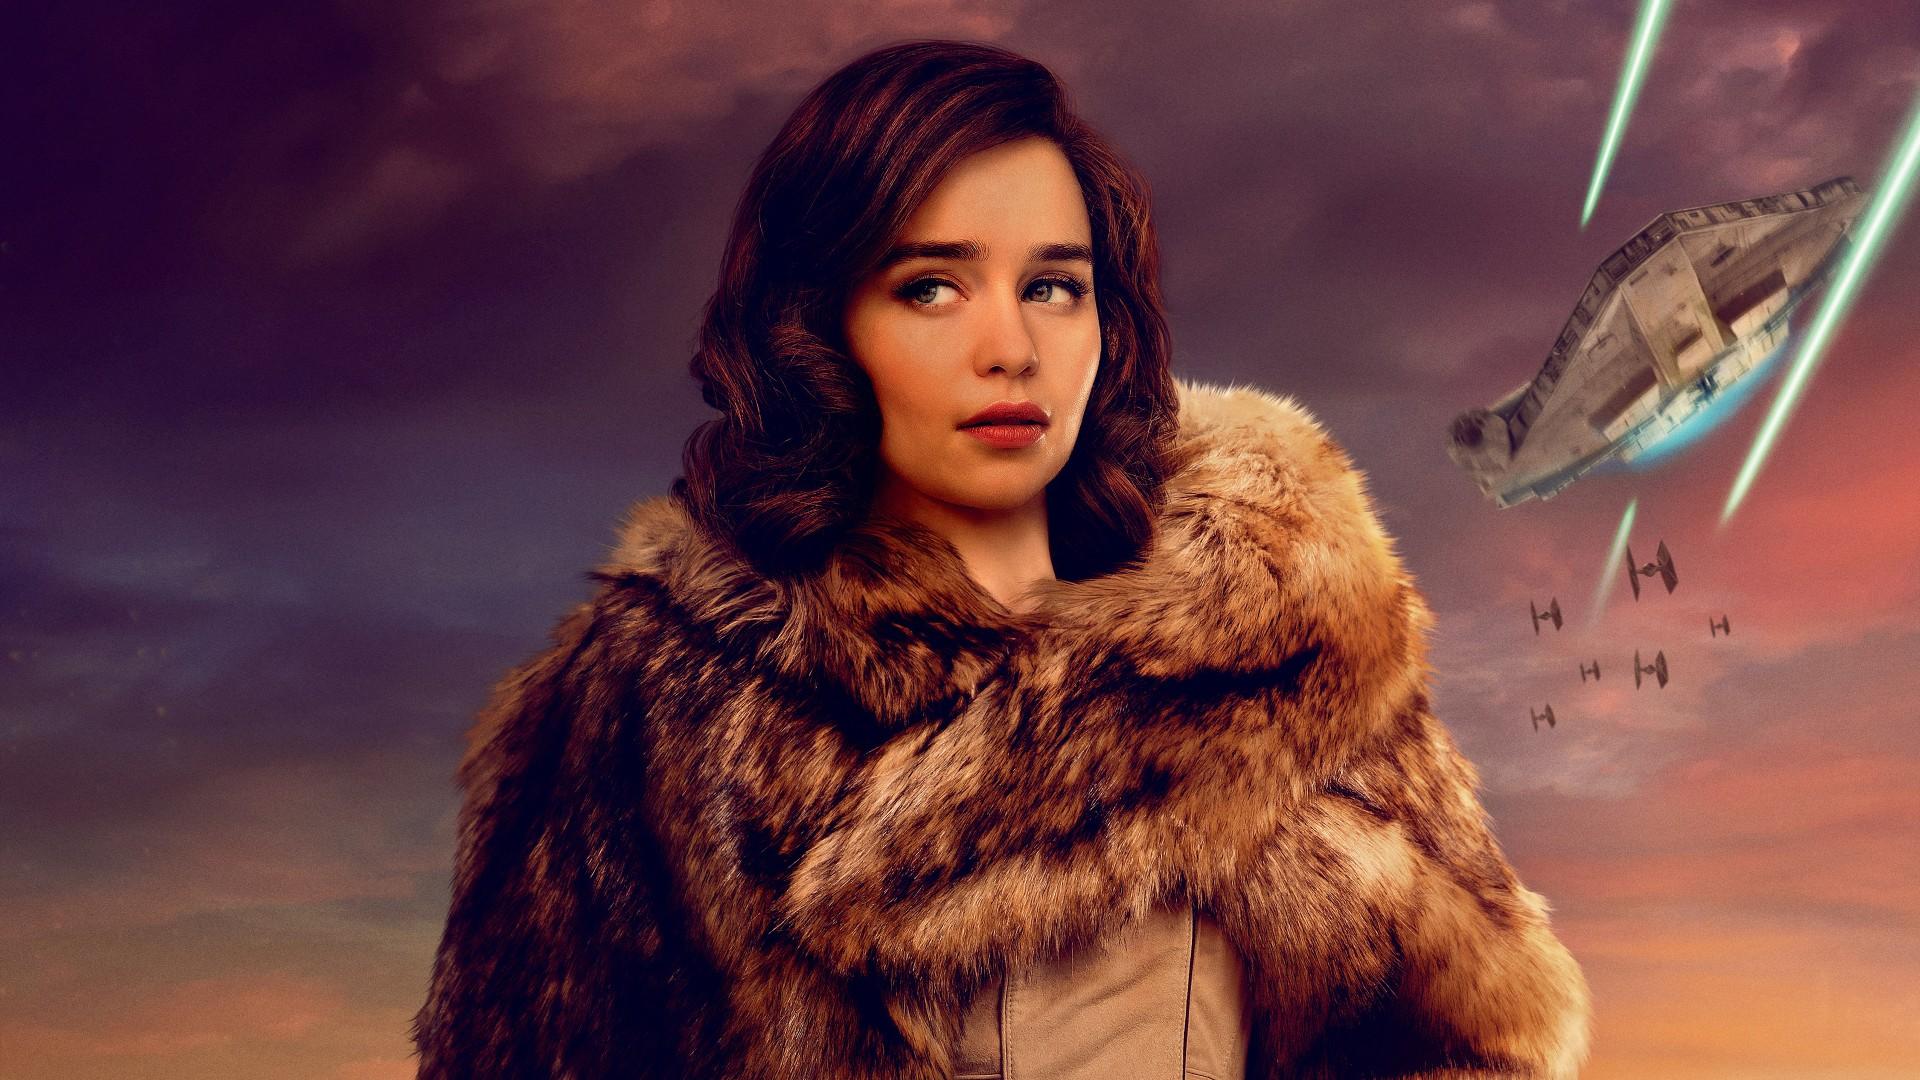 Download Apple Wallpaper Hd For Windows 7 Qi Ra Solo A Star Wars Story Emilia Clarke 4k Wallpapers